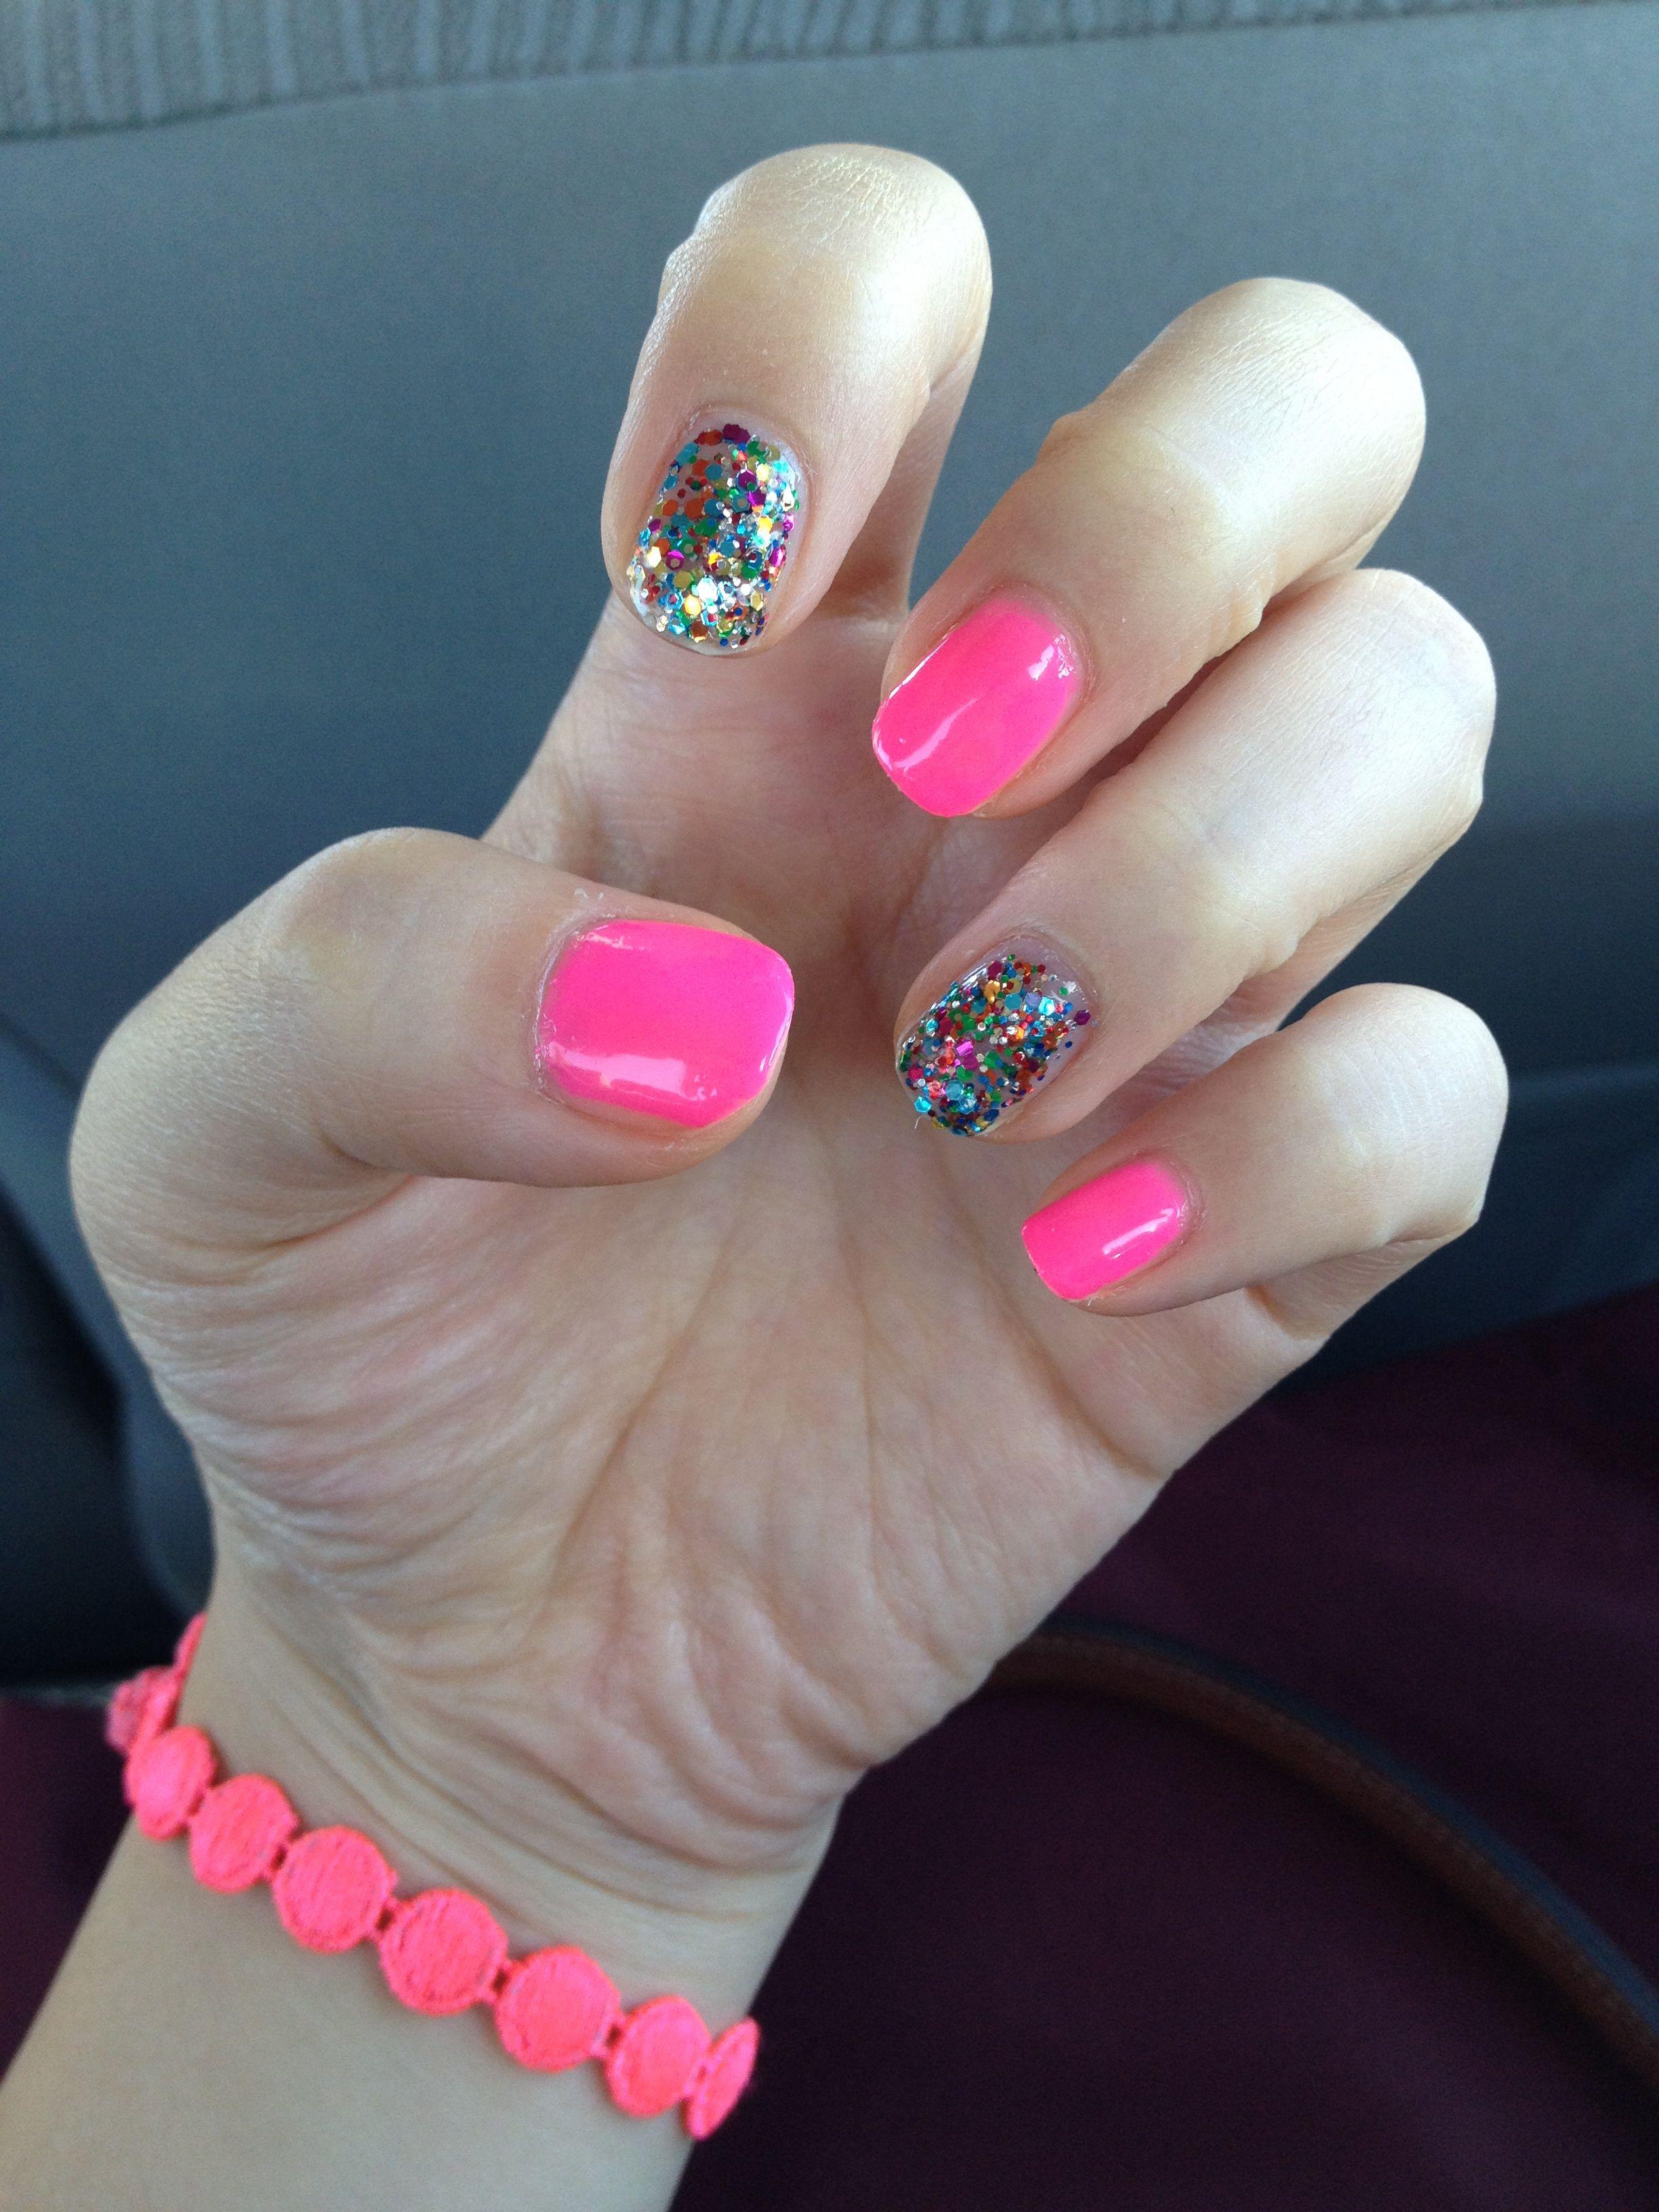 Favorite summer nails